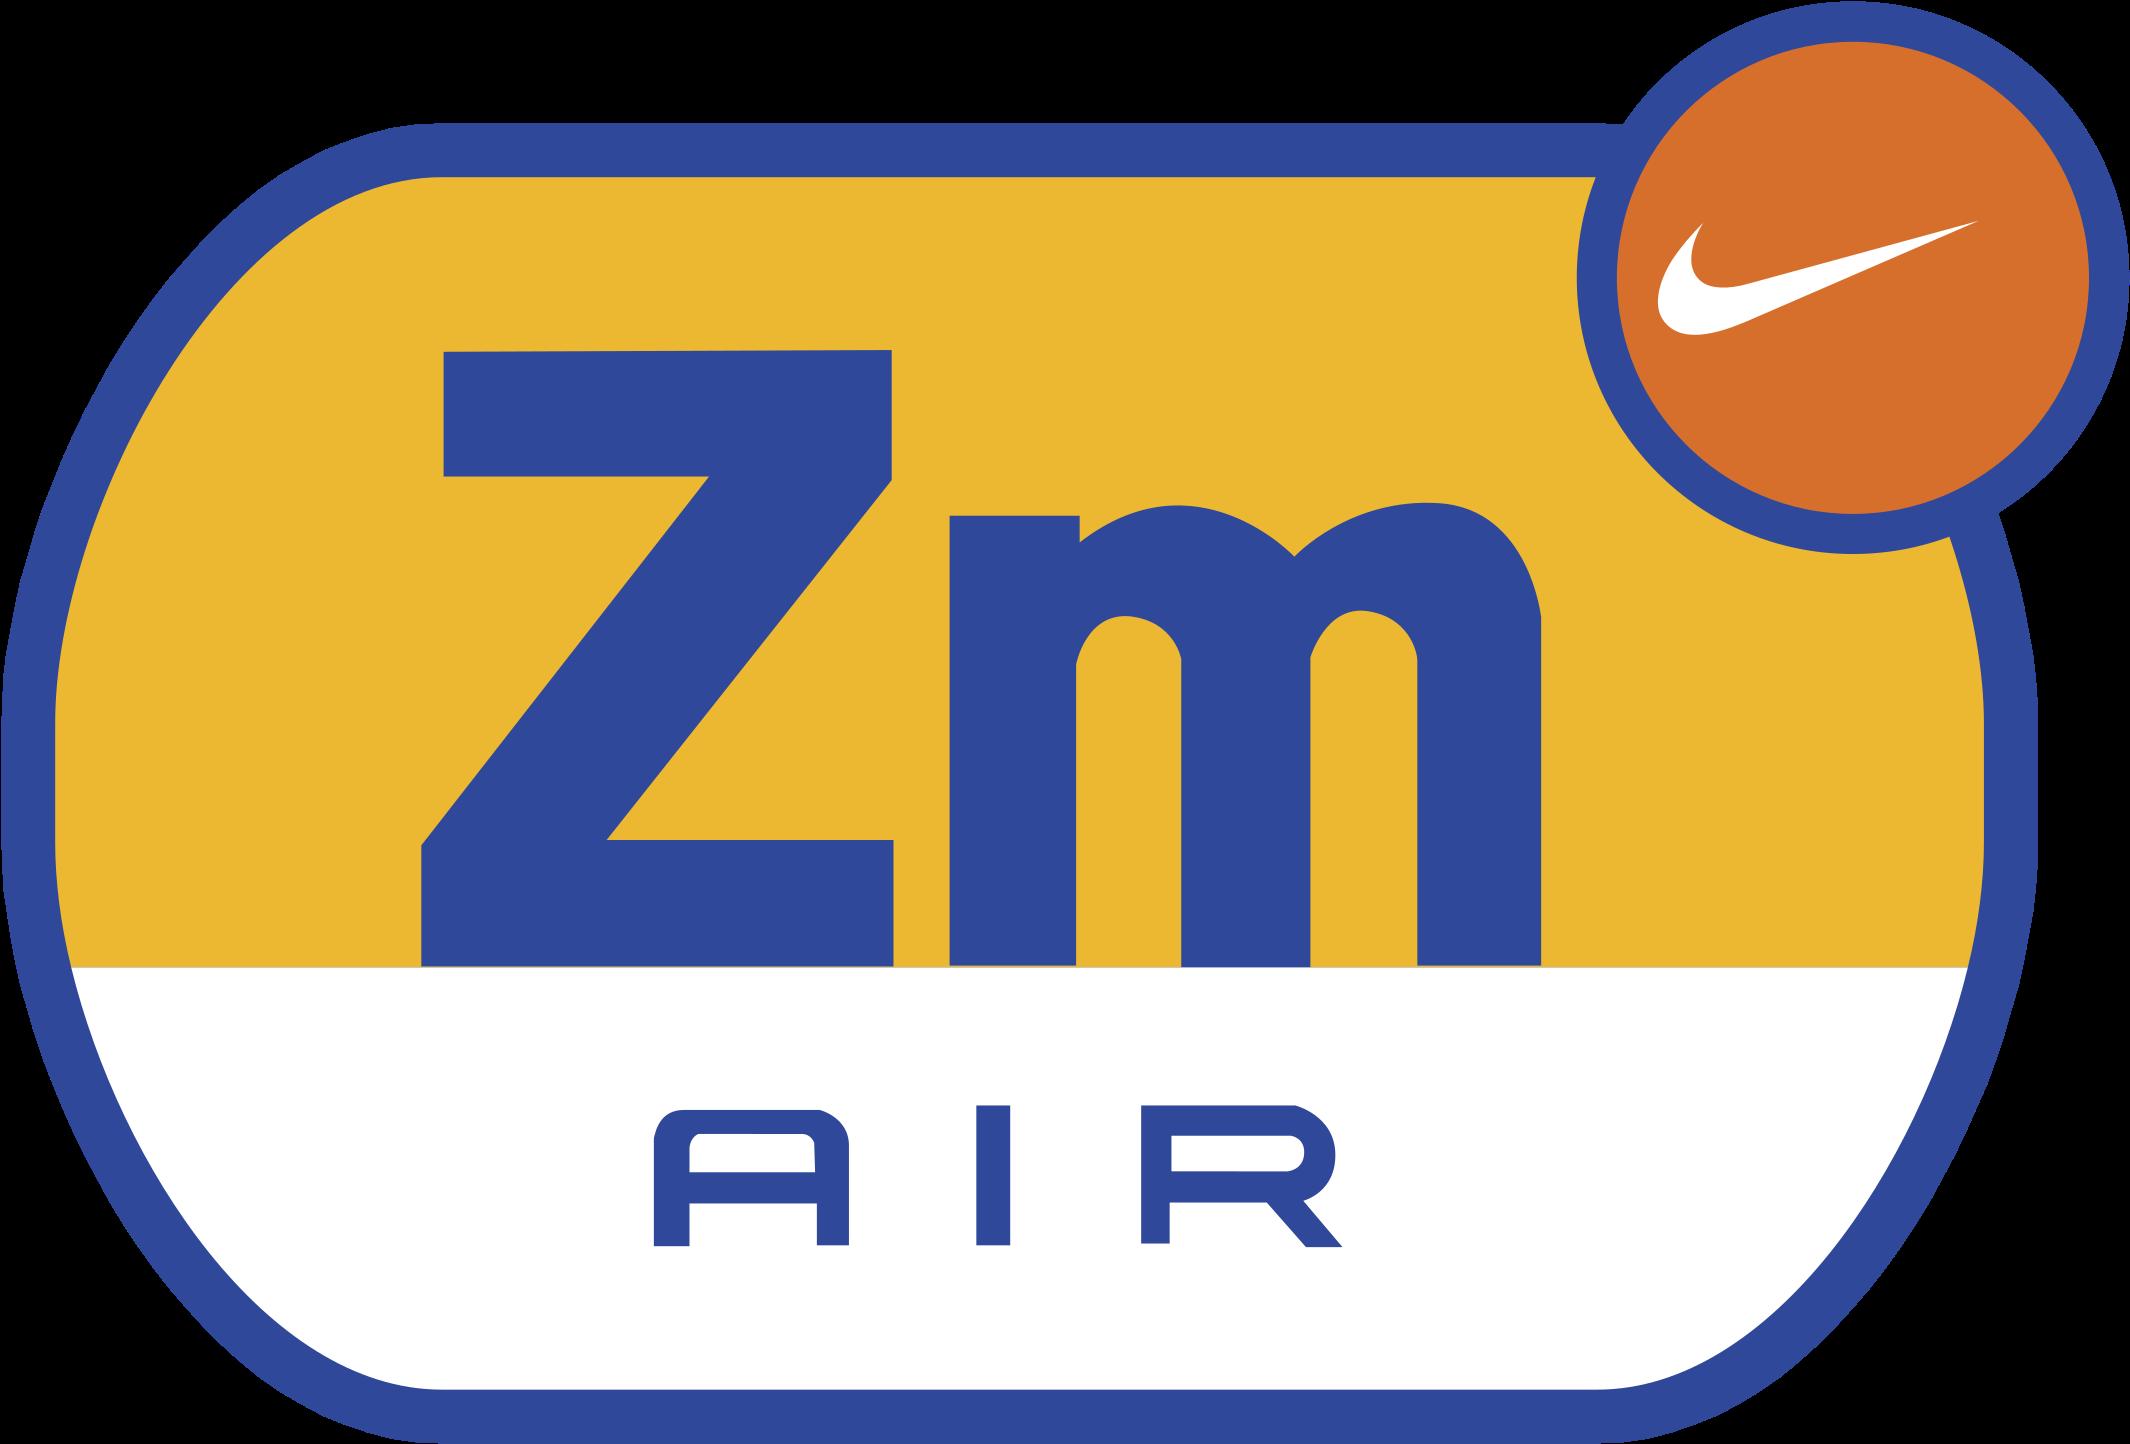 Download Air Zoom Logo Png Transparent Nike Zoom Kd Line Full Size Png Image Pngkit